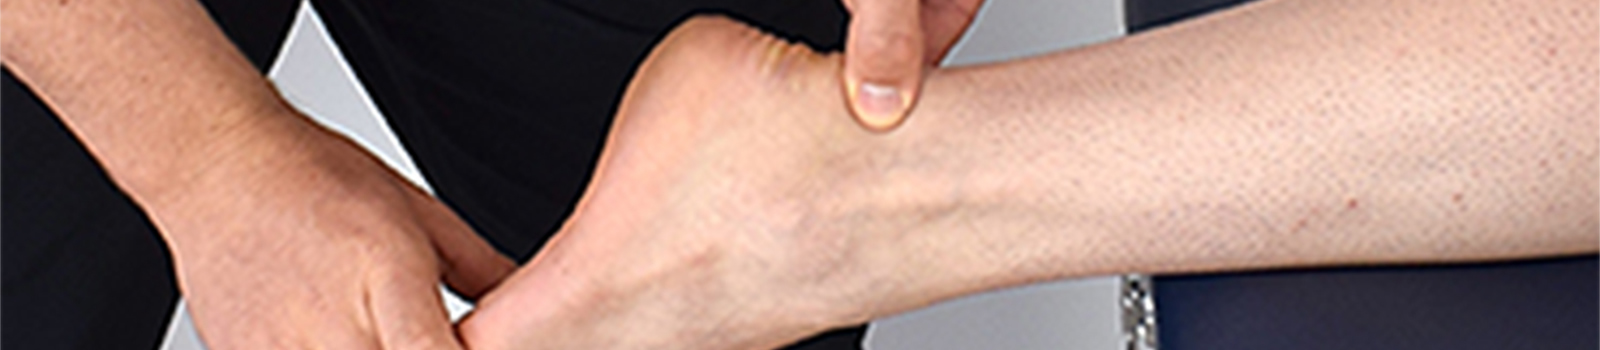 Abordaje de las tendinopatías